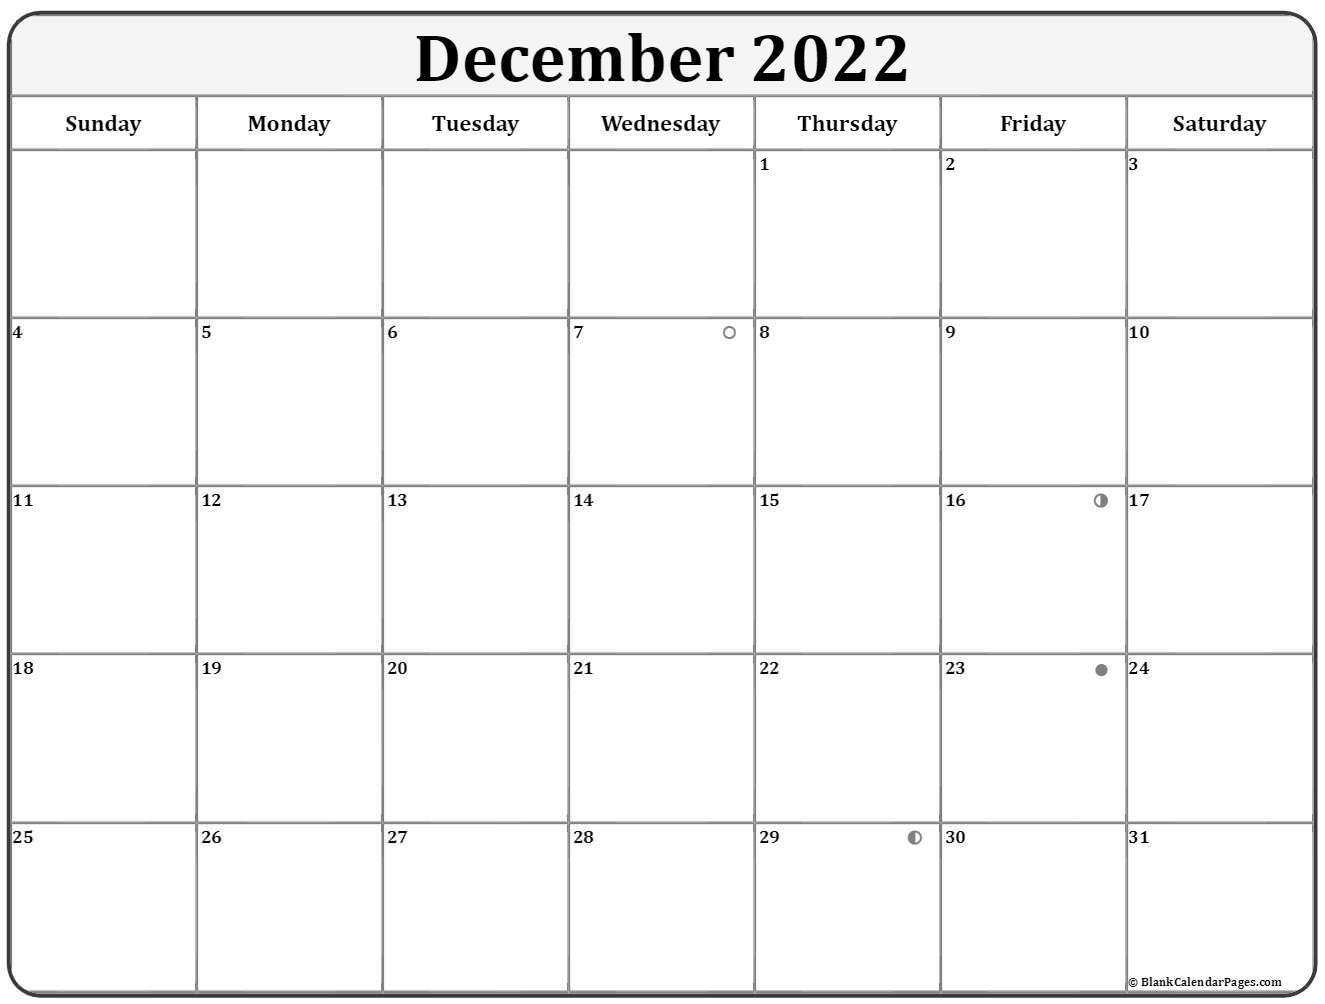 December 2019 moon phase calendar. lunar calendar